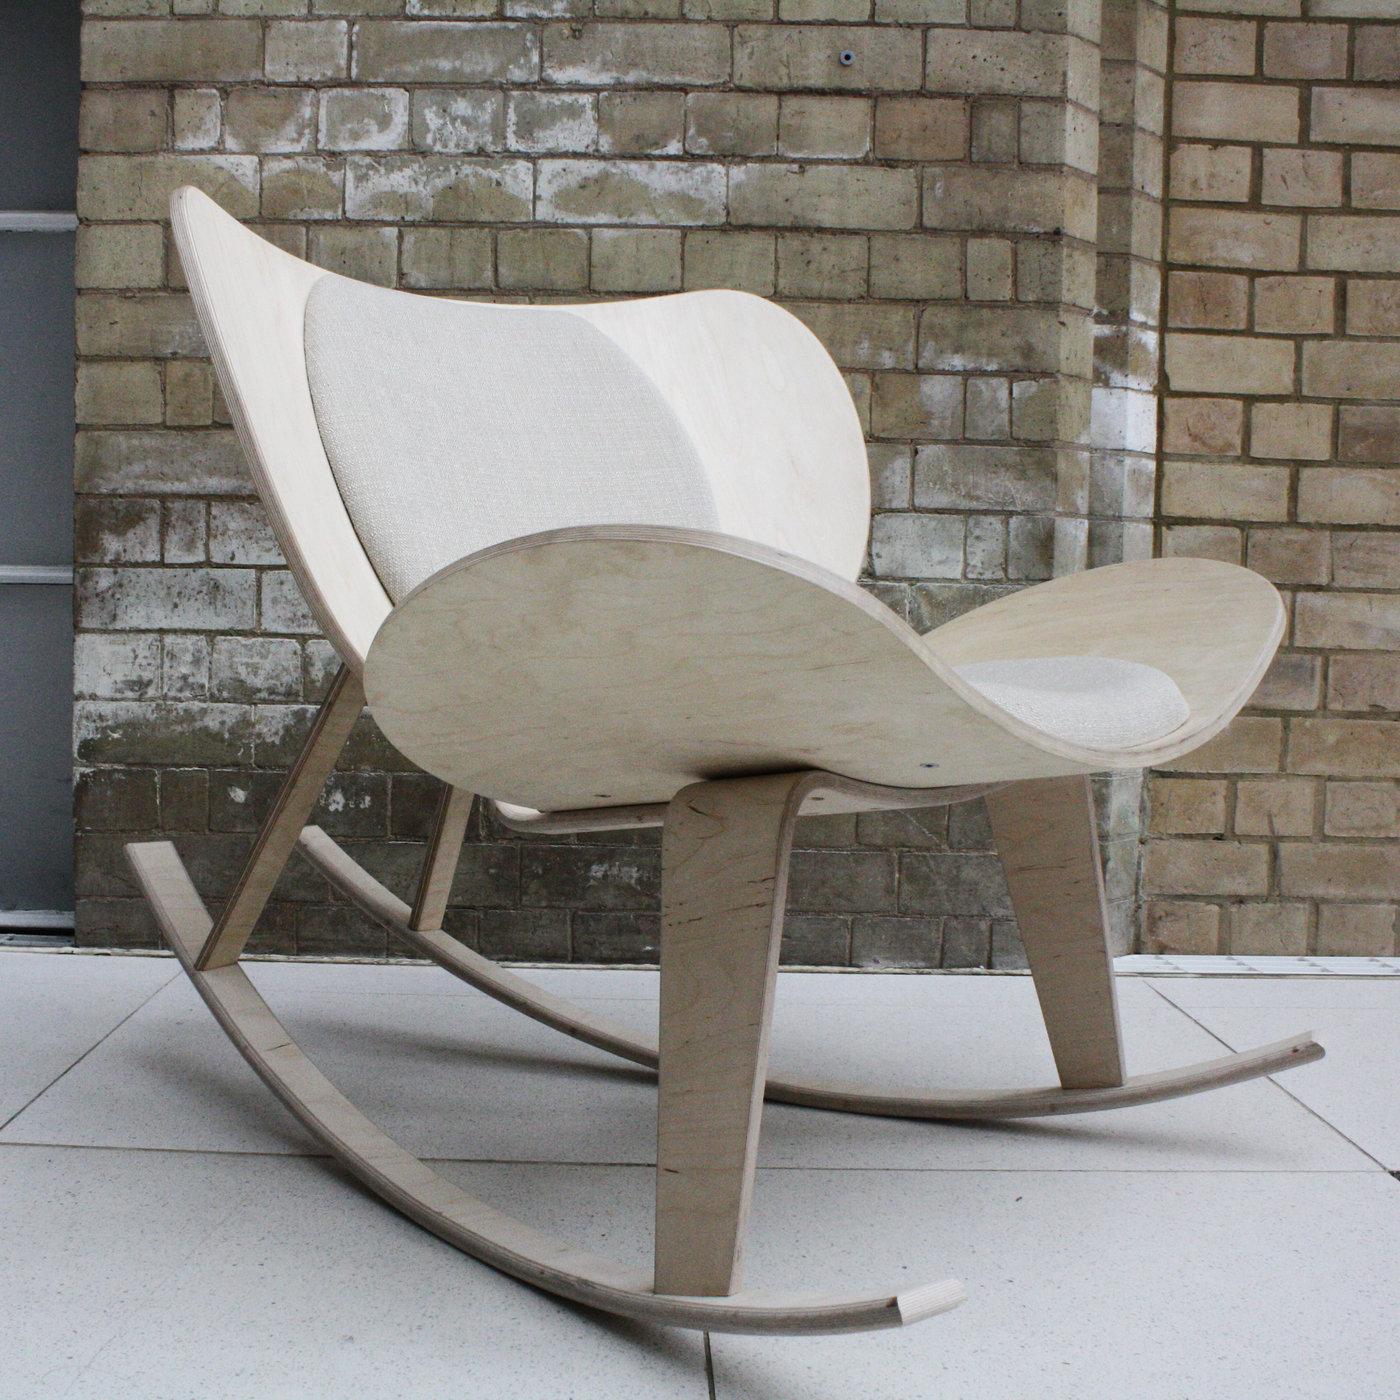 Suzani Rocking Chair By Rachael Orsman At Coroflot Com